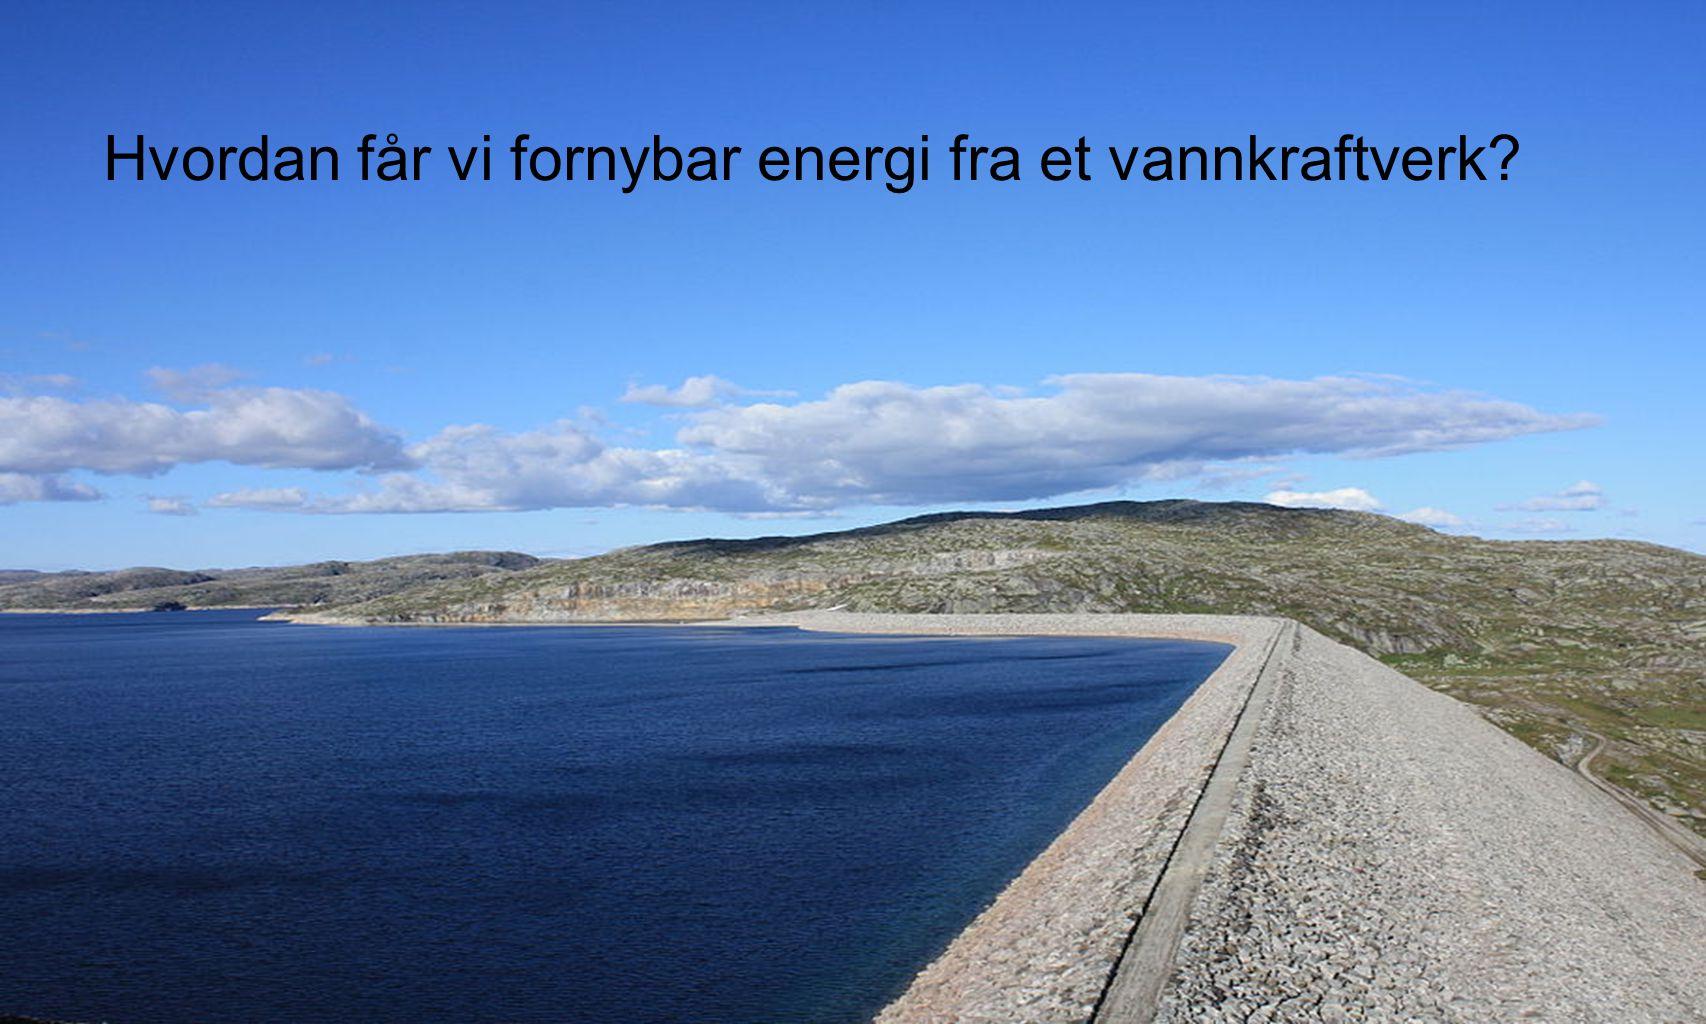 Hvordan får vi fornybar energi fra et vannkraftverk